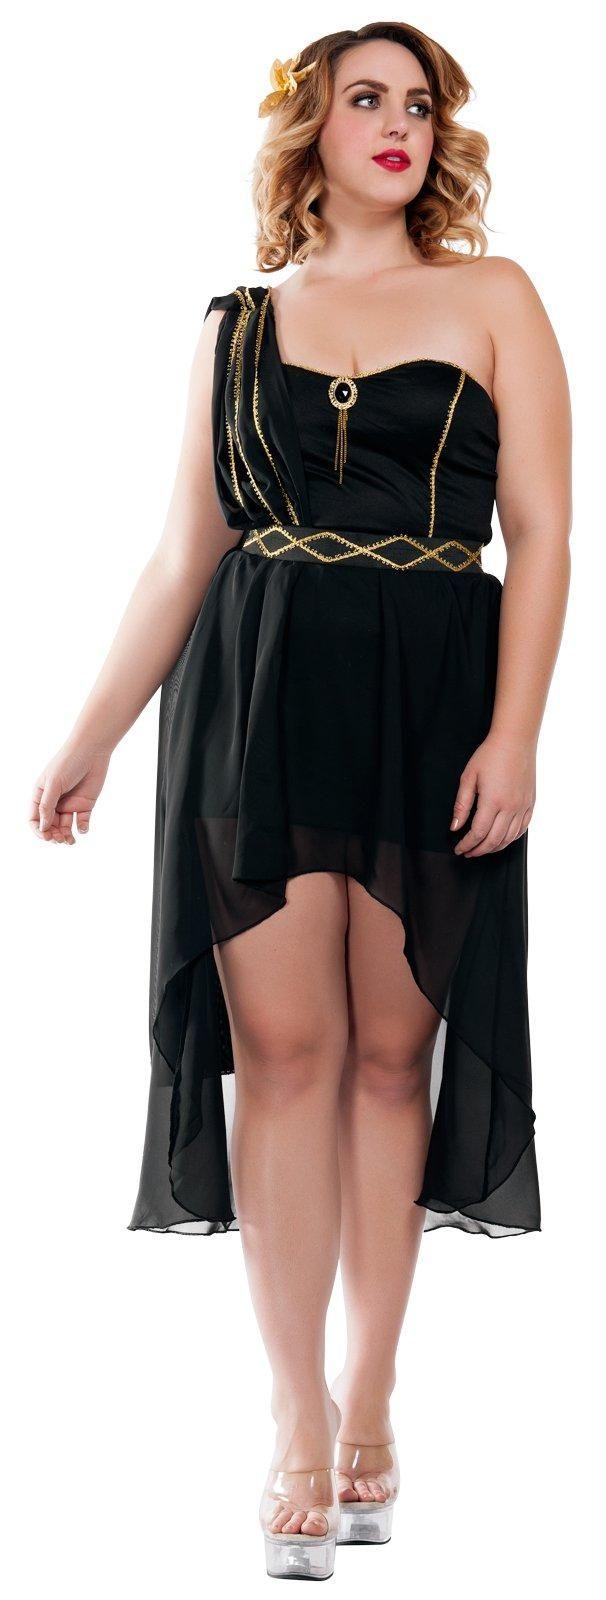 Womens Plus Size Dark Greek Goddess Costume from Buycostumes.com